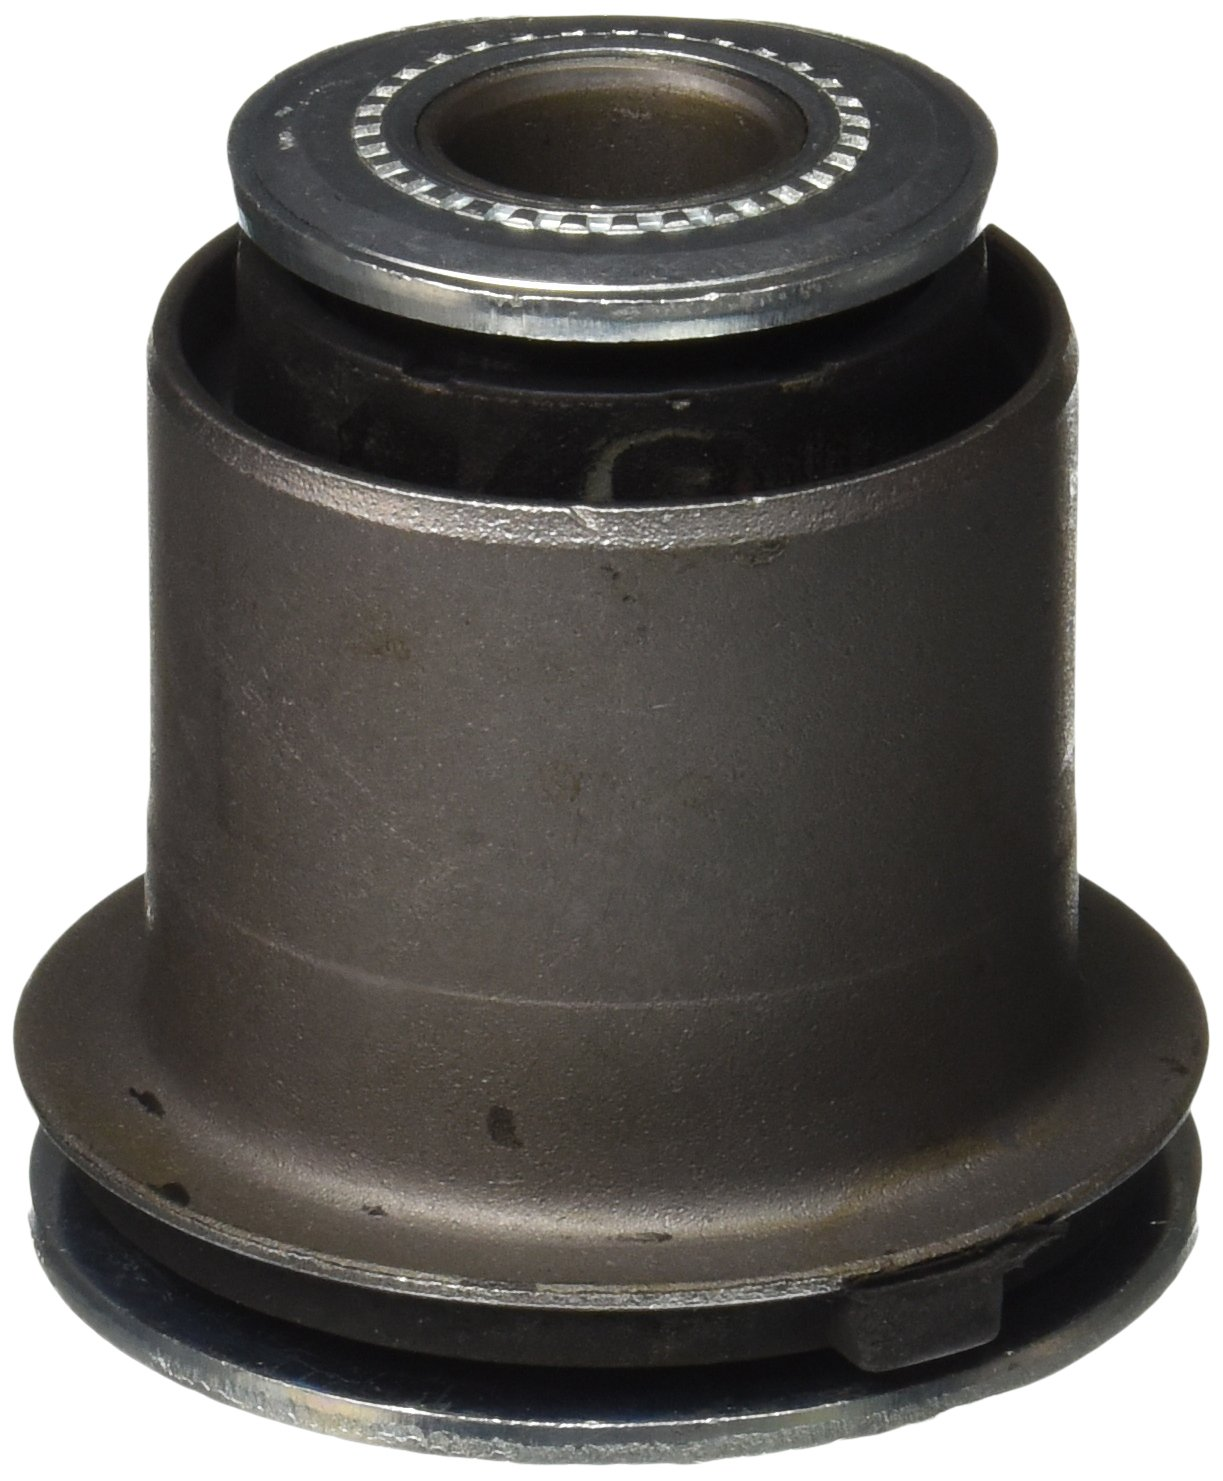 Moog K200126 Control Arm Bushing Kit Federal Mogul